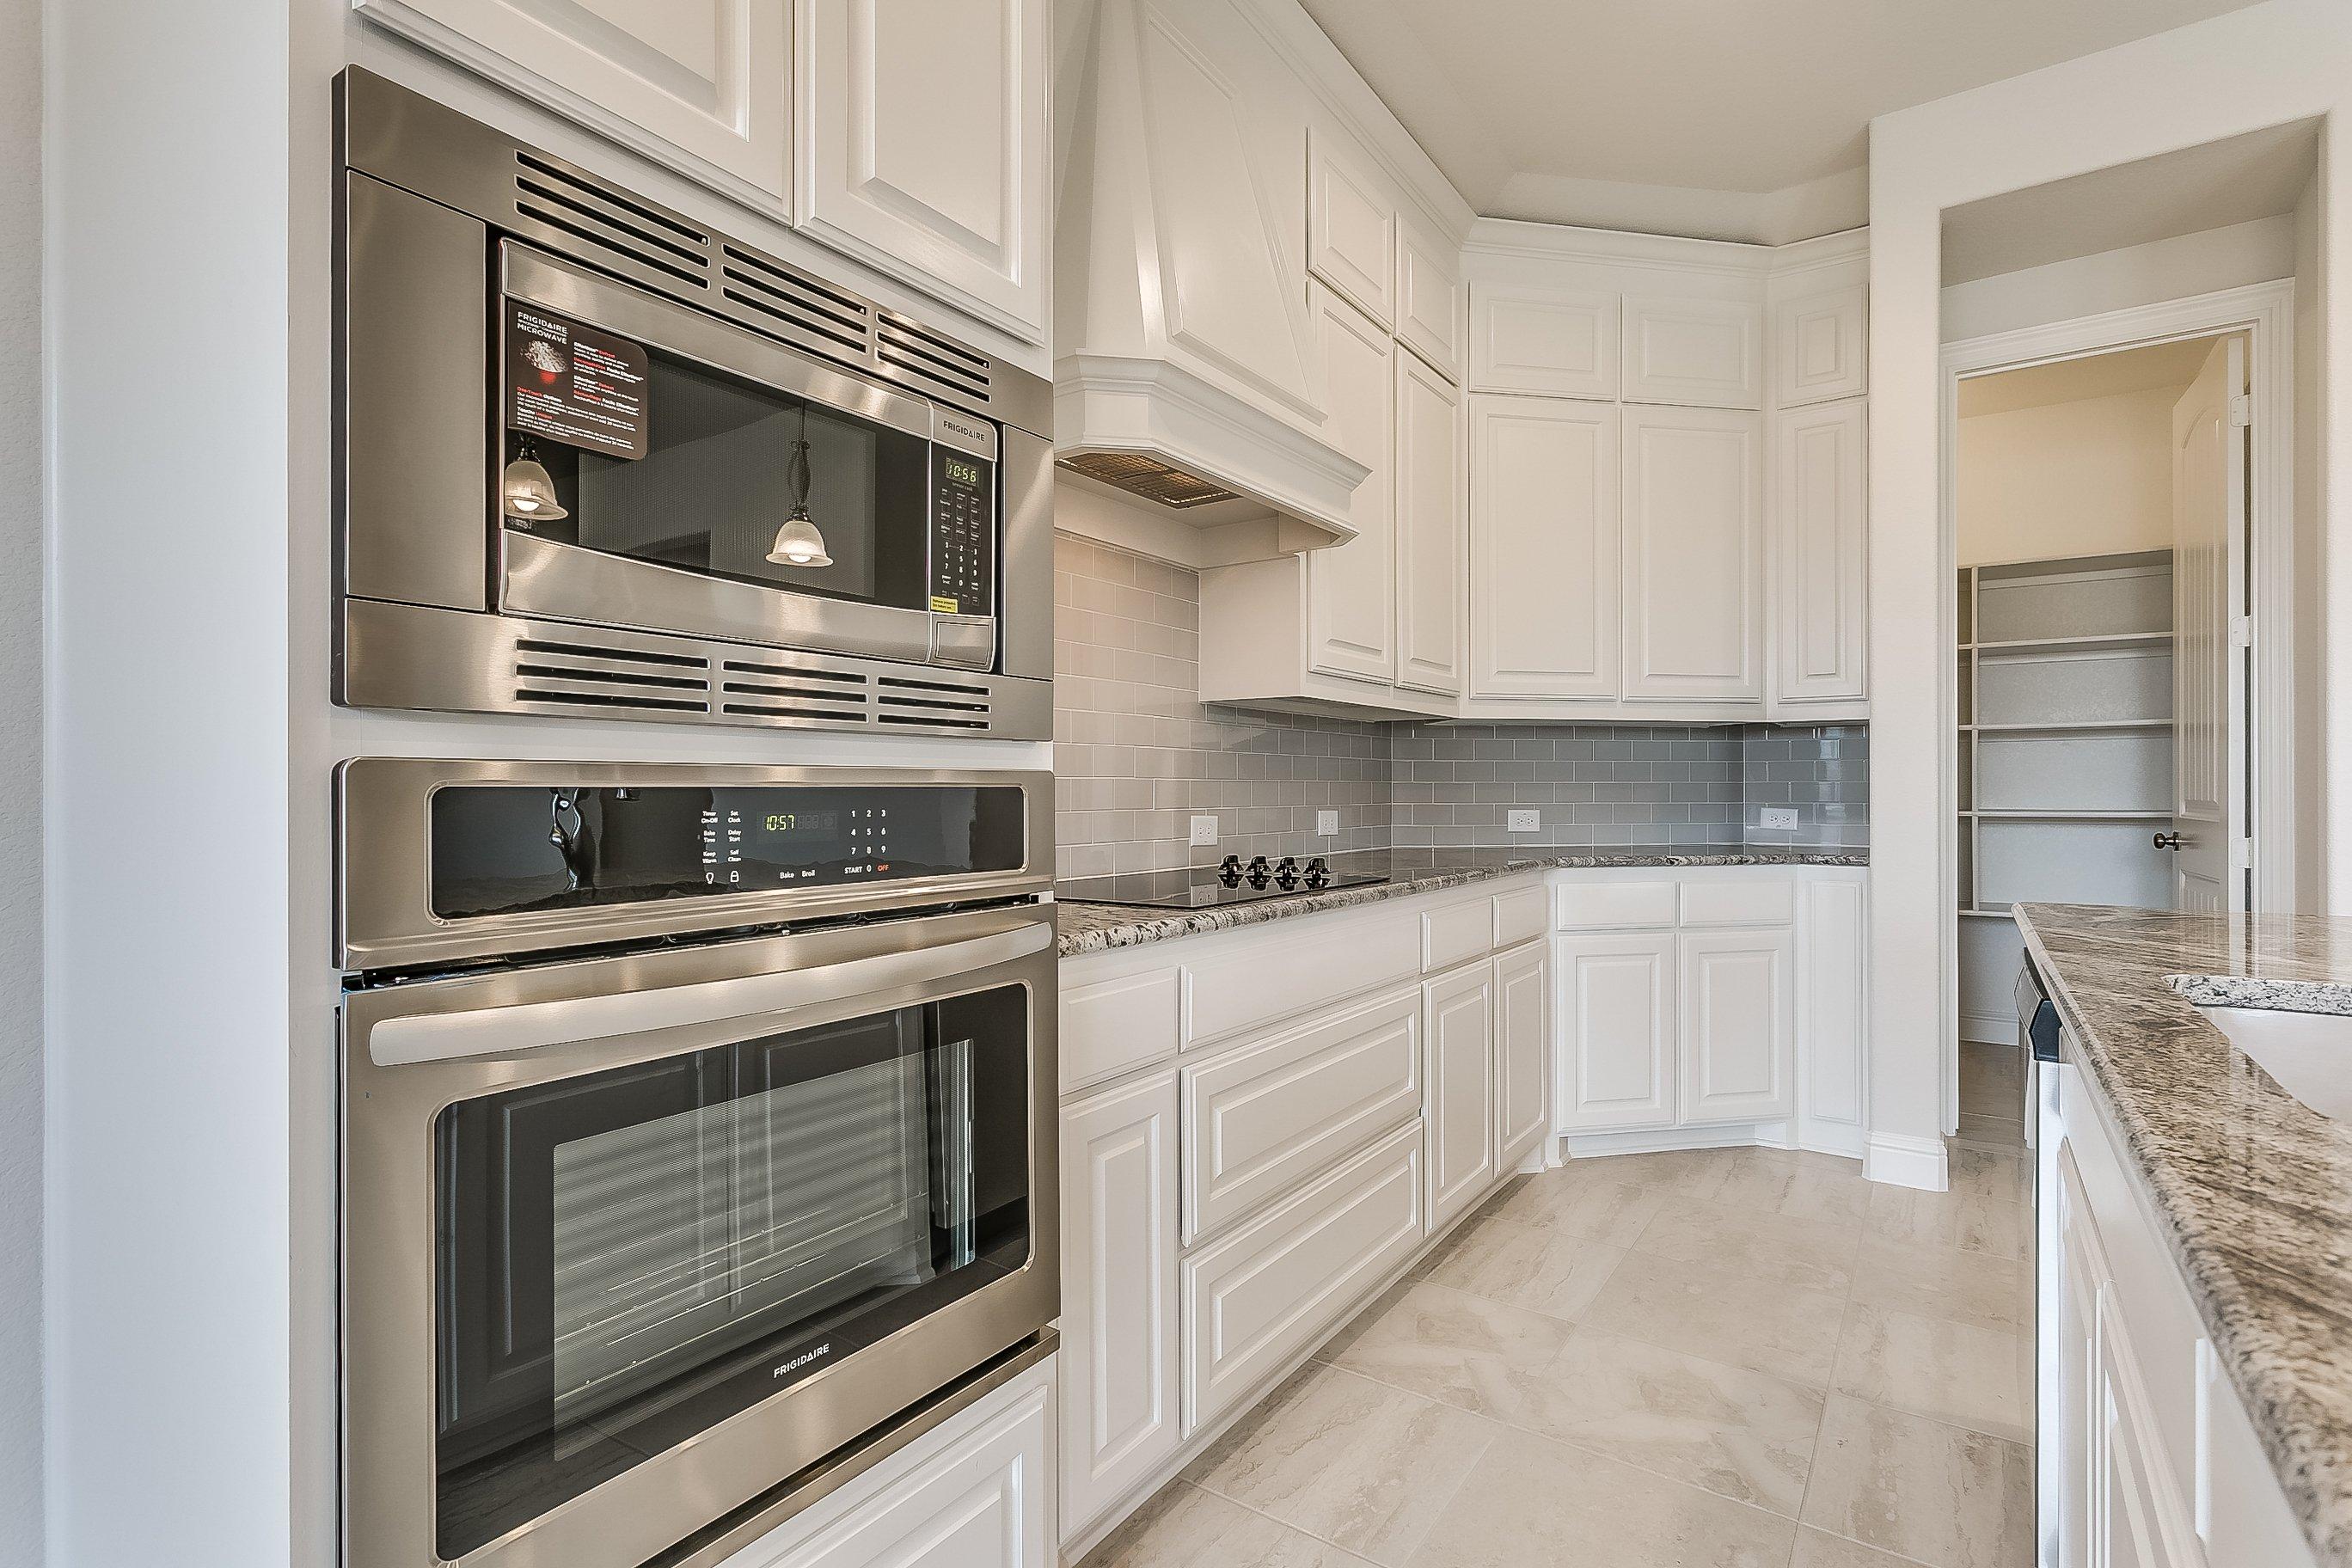 1113 Autumn Trail - John Houston Custom Homes - kitchen, custom cabinets, farmhouse, built in appliances, large pantry